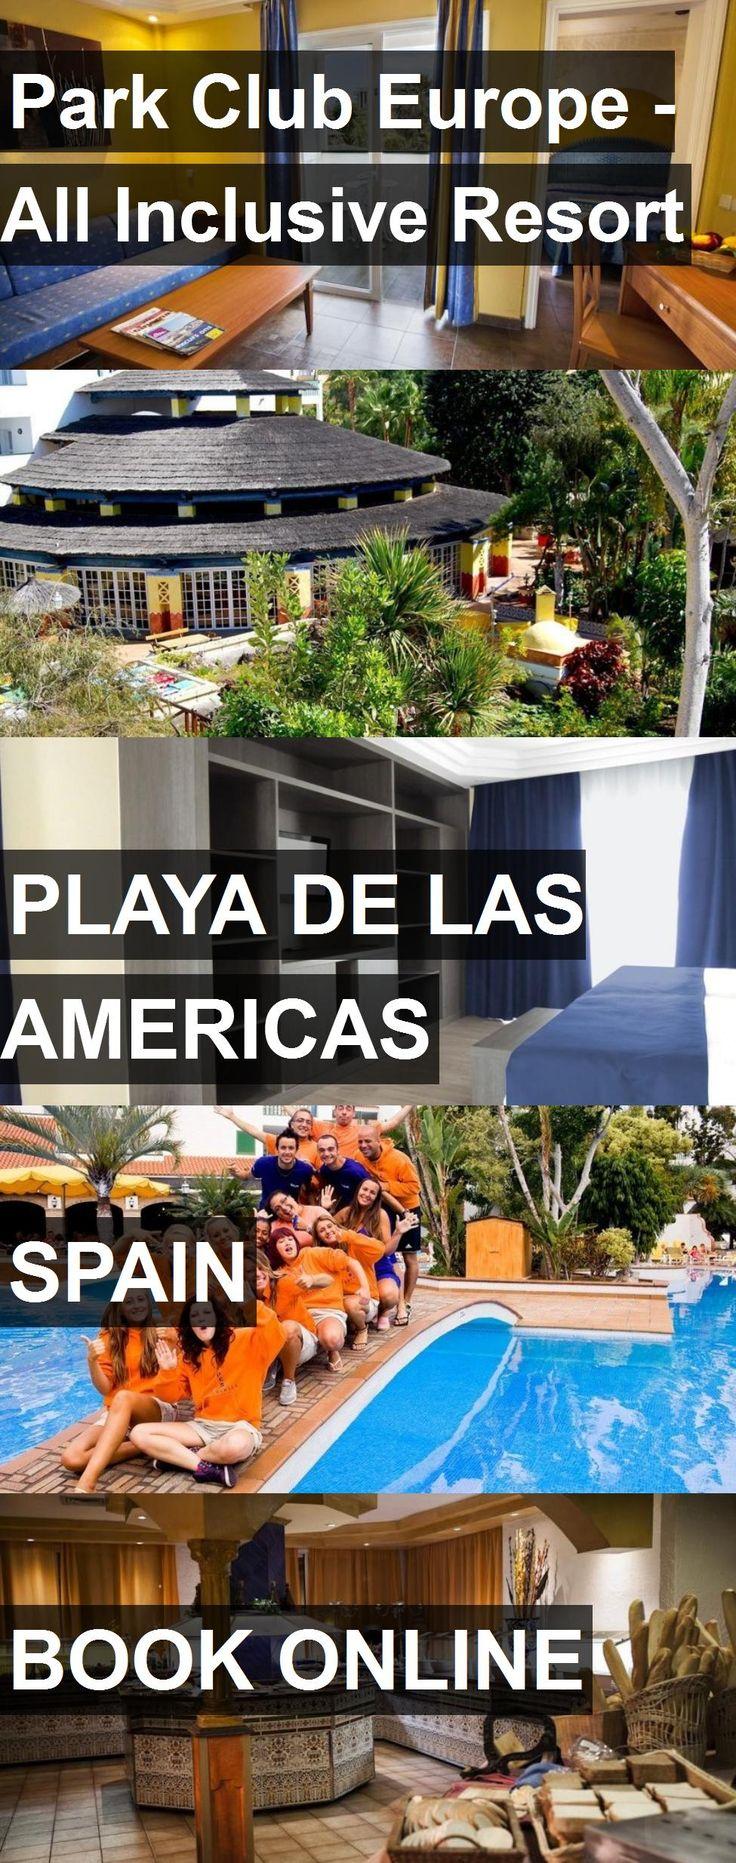 Best All Inclusive Spain Ideas On Pinterest All Inclusive - All inclusive italy vacations